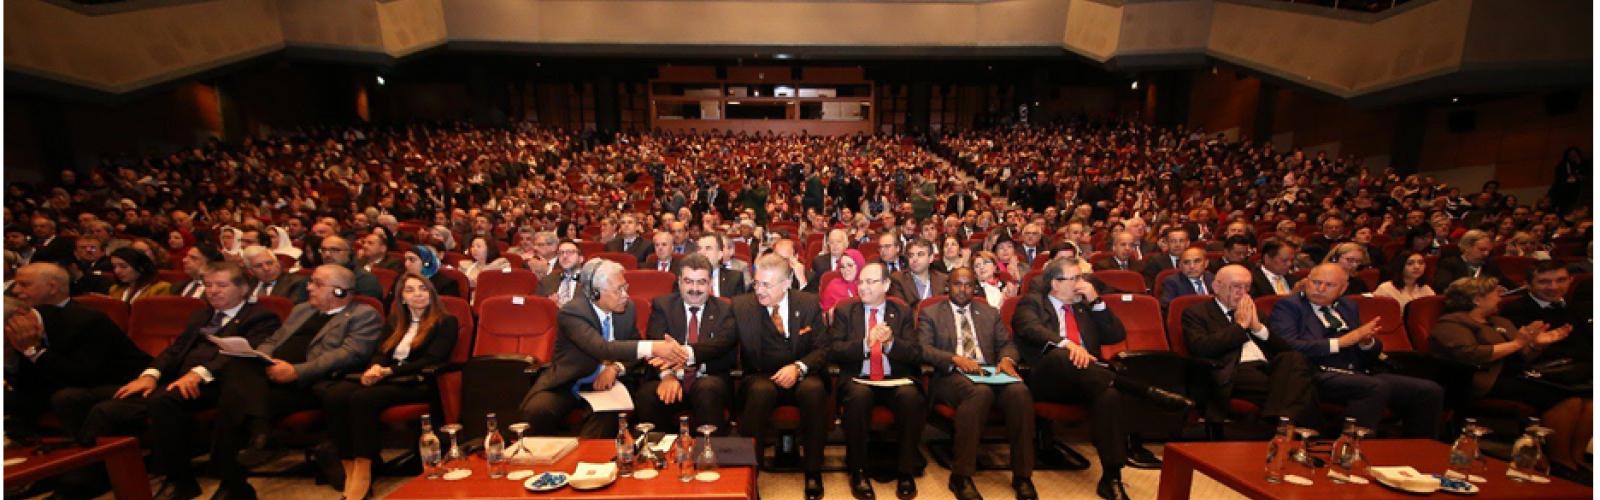 Palestine Polytechnic University (PPU) - مشاركة جامعة بوليتكنك فلسطين في مؤتمر الجامعات التركية-العربية (Turkish-Arab Universities Conference ) وقمة مؤسسات التعليم العالي لمنطقة يوراسيا (EURASIA HE Summit 2018)